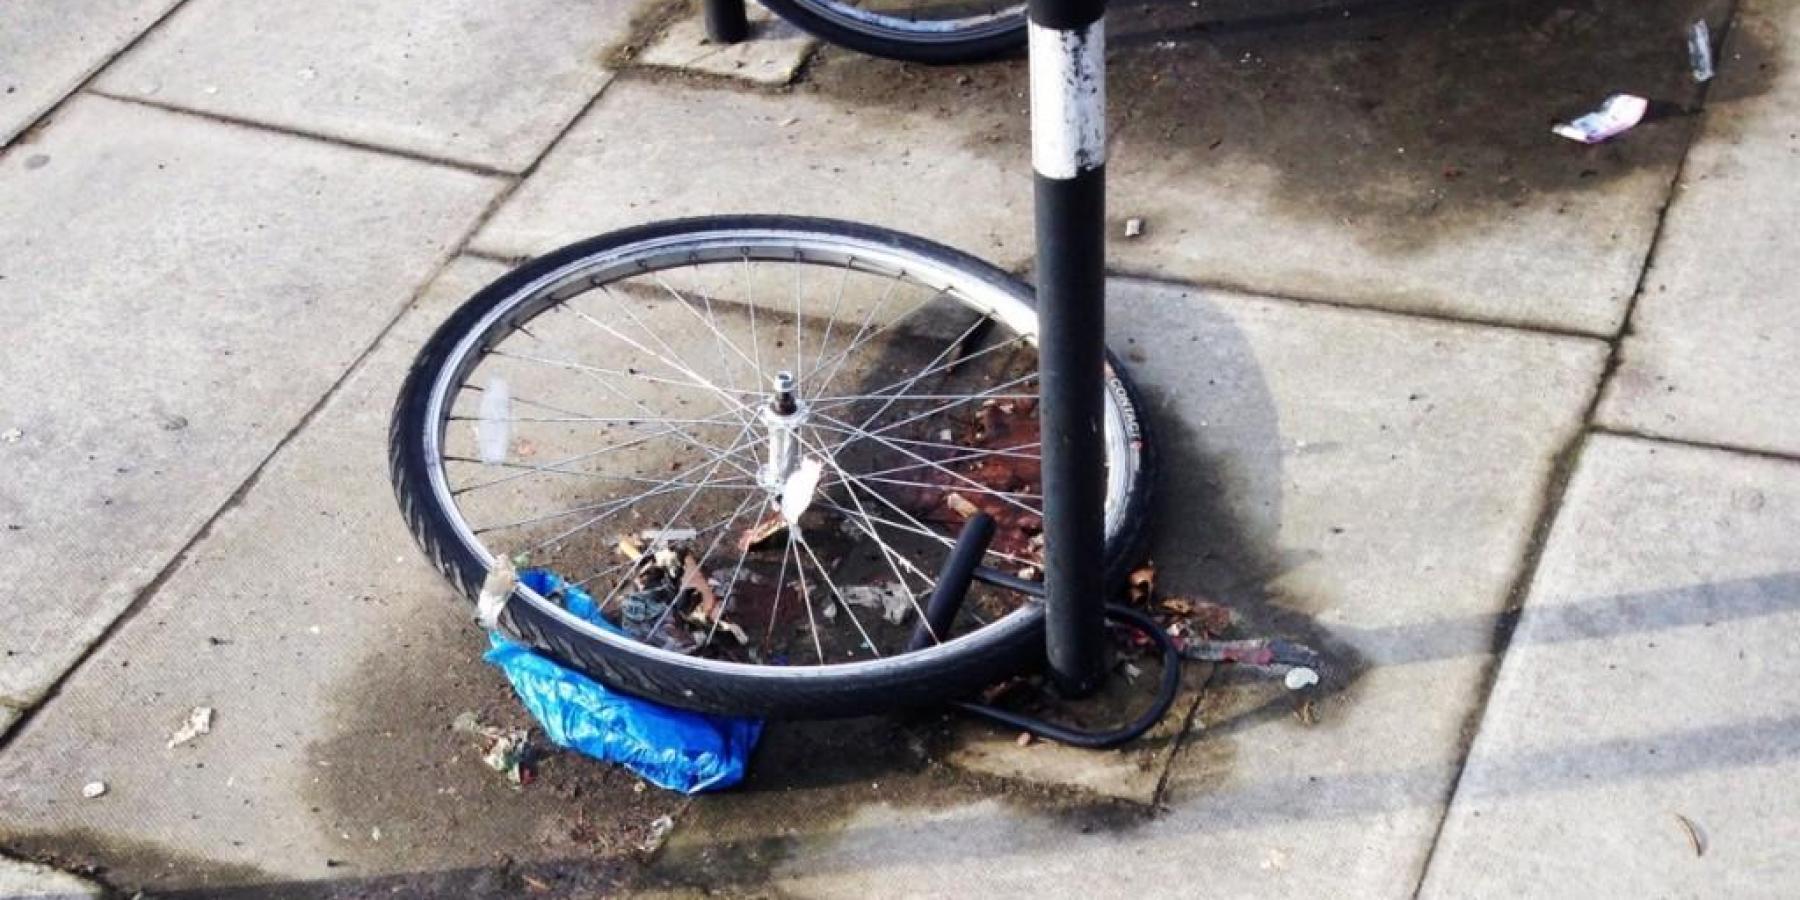 Fahrradfahrer mit gestohlener Leeze missachtet Verkehrsregel